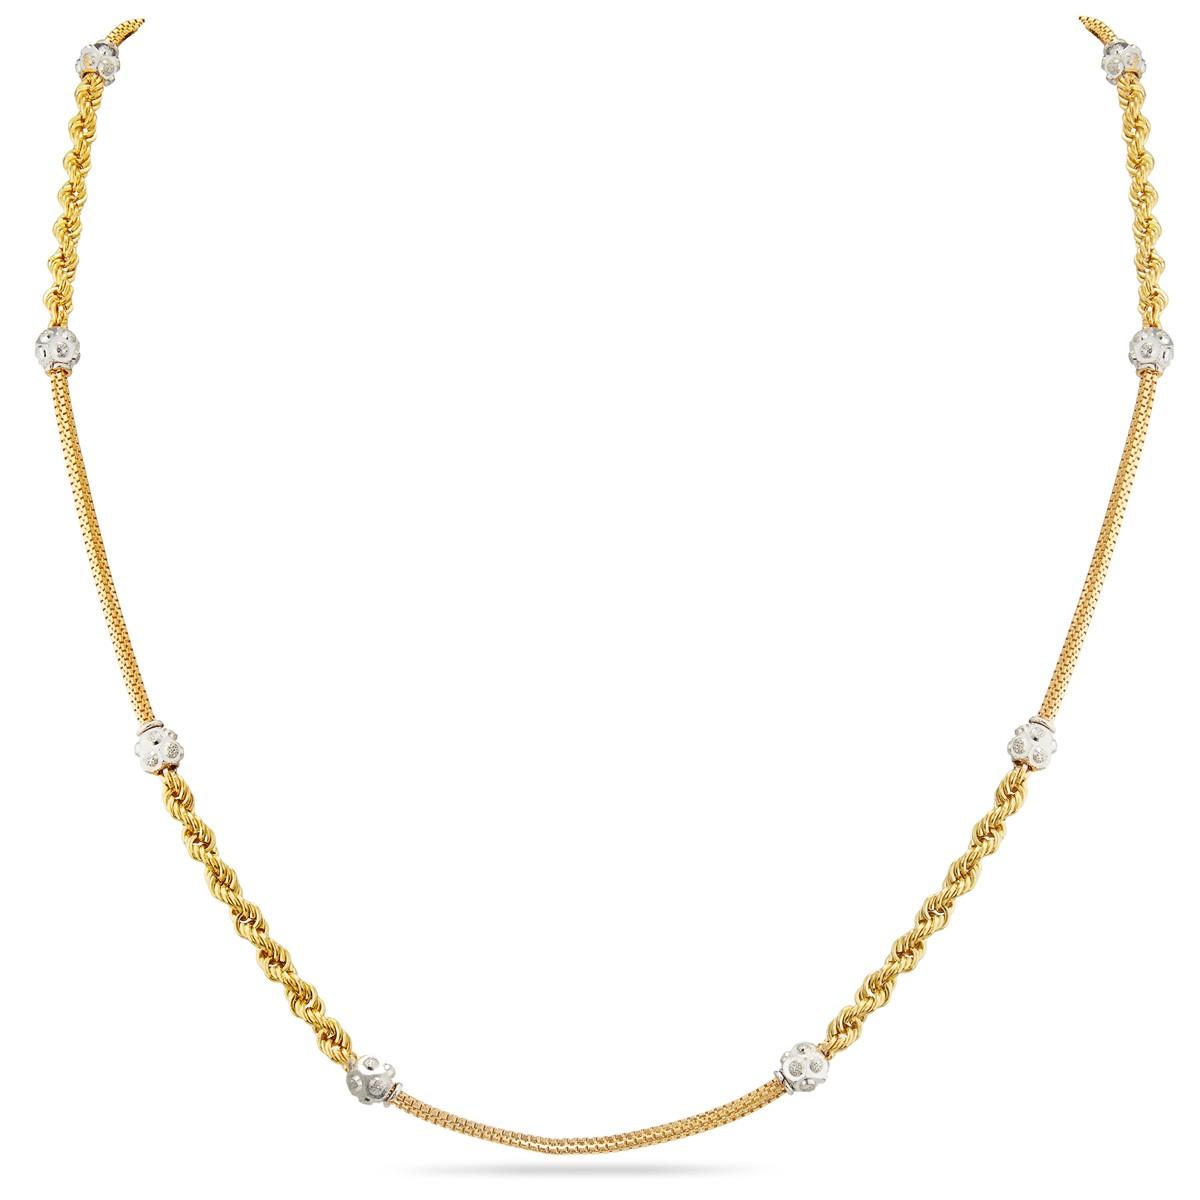 Buy Twist And Straight Design Chains Rhodium Finish Gold